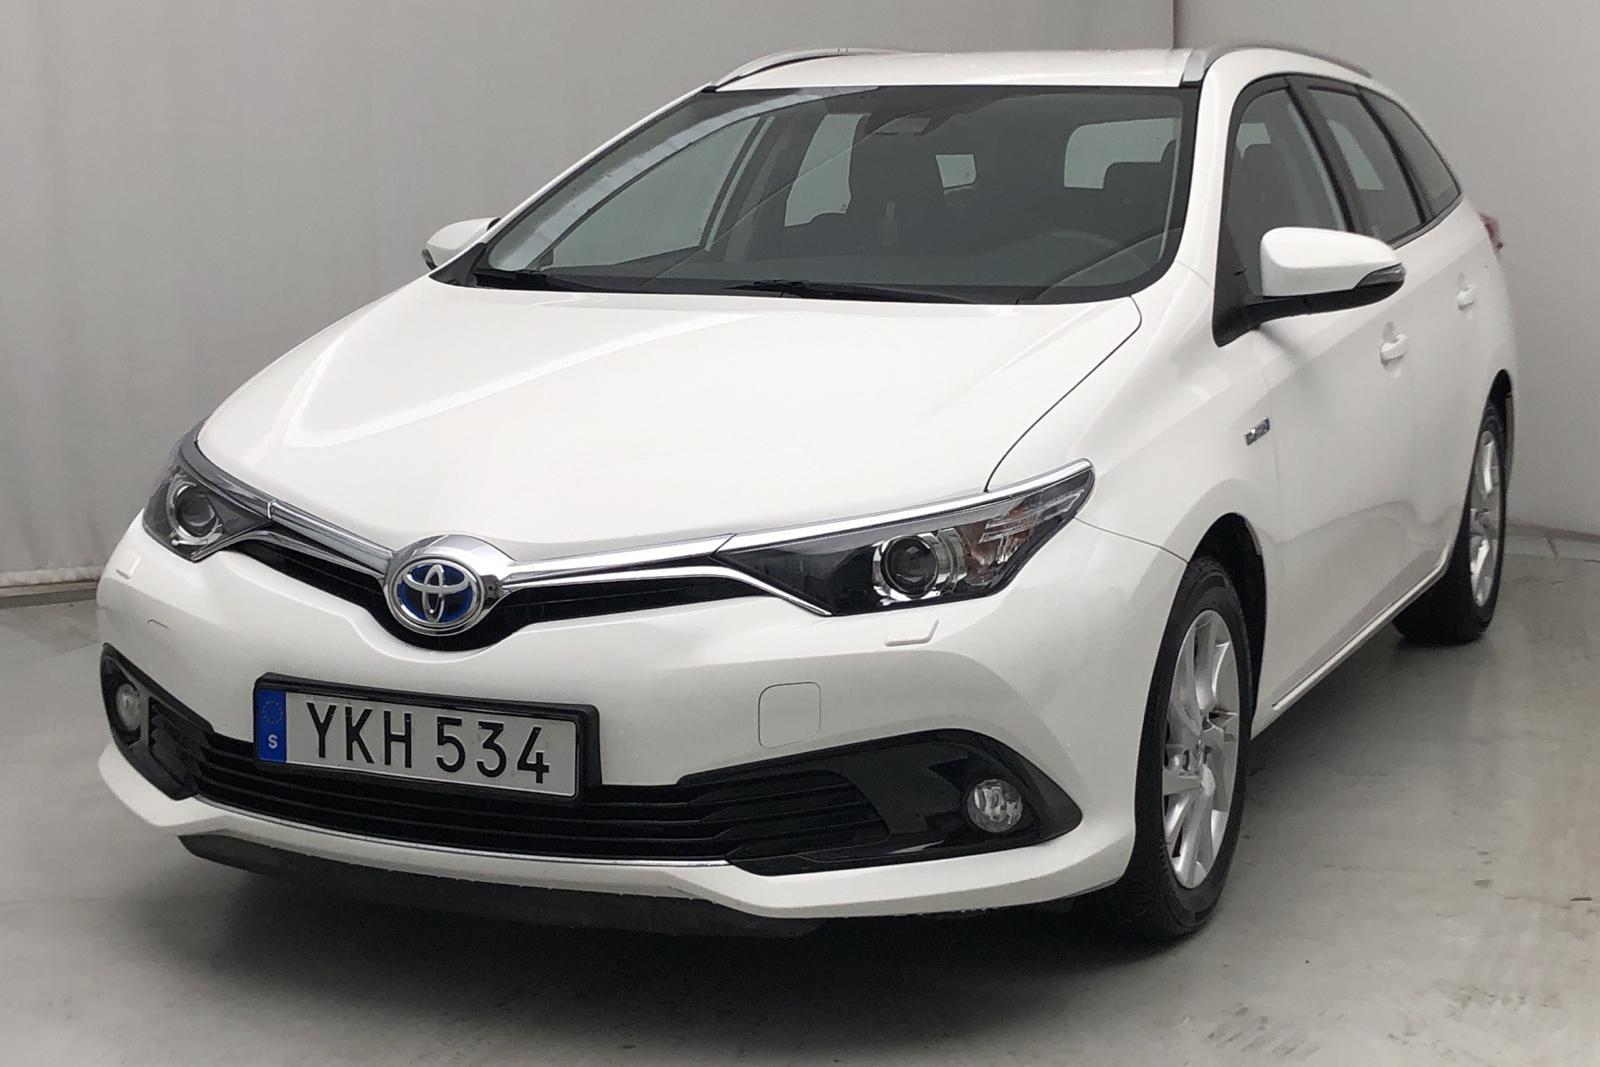 Toyota Auris 1.8 HSD Touring Sport (99hk) - 35 000 km - Automatic - white - 2017